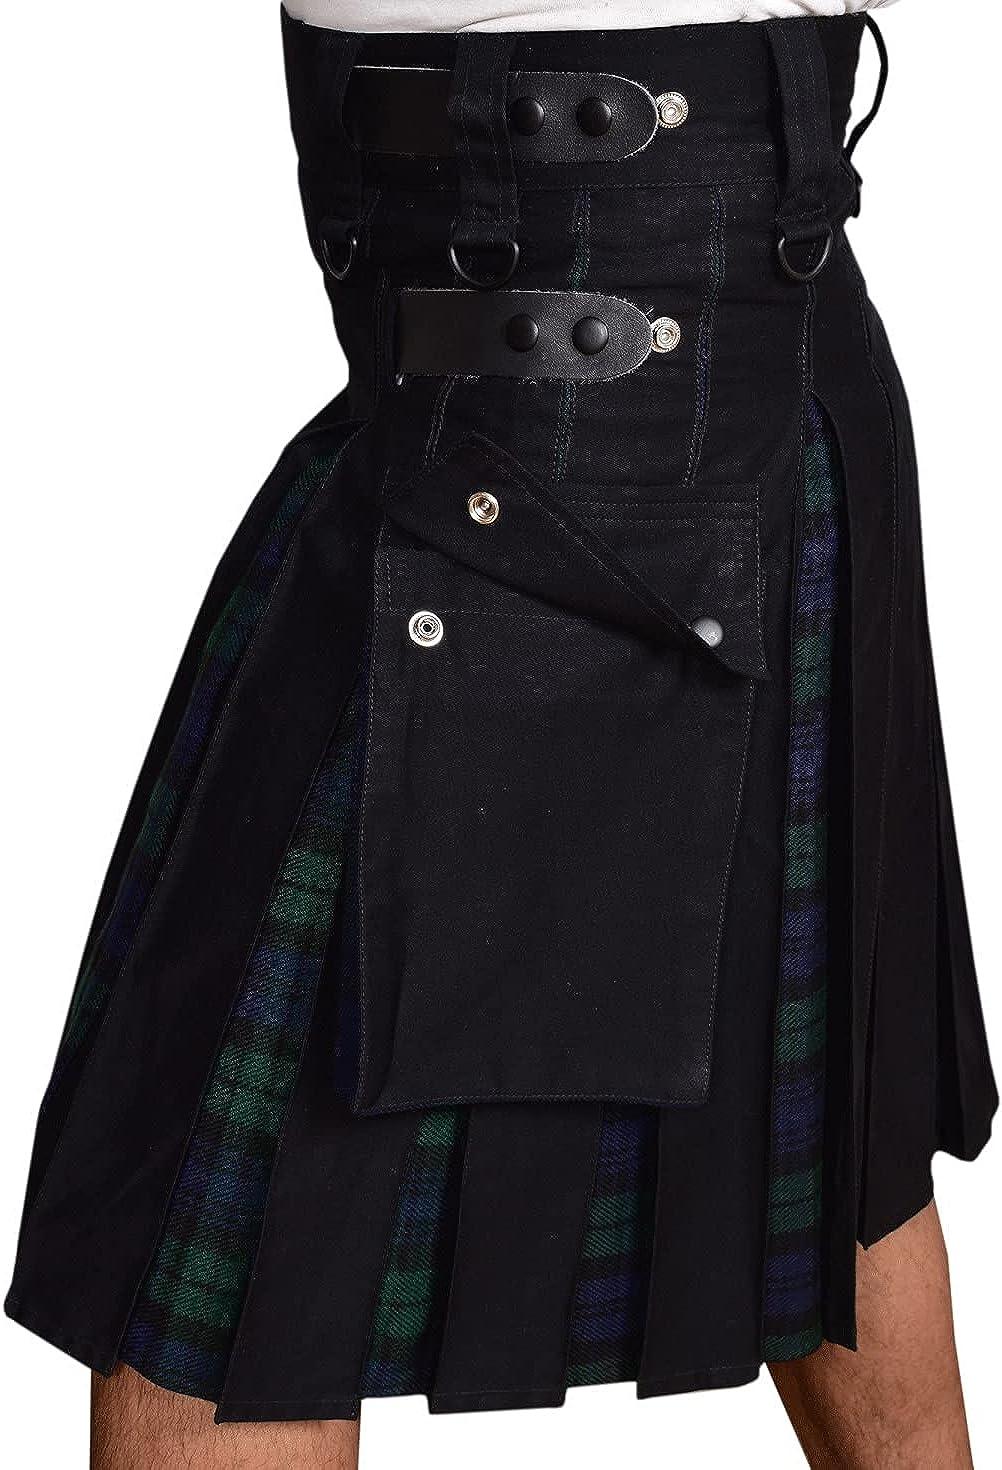 UFS Kilts-Men's Max 57% OFF Max 42% OFF Plus Size Scottish Hybrid Cotton Tartan Black